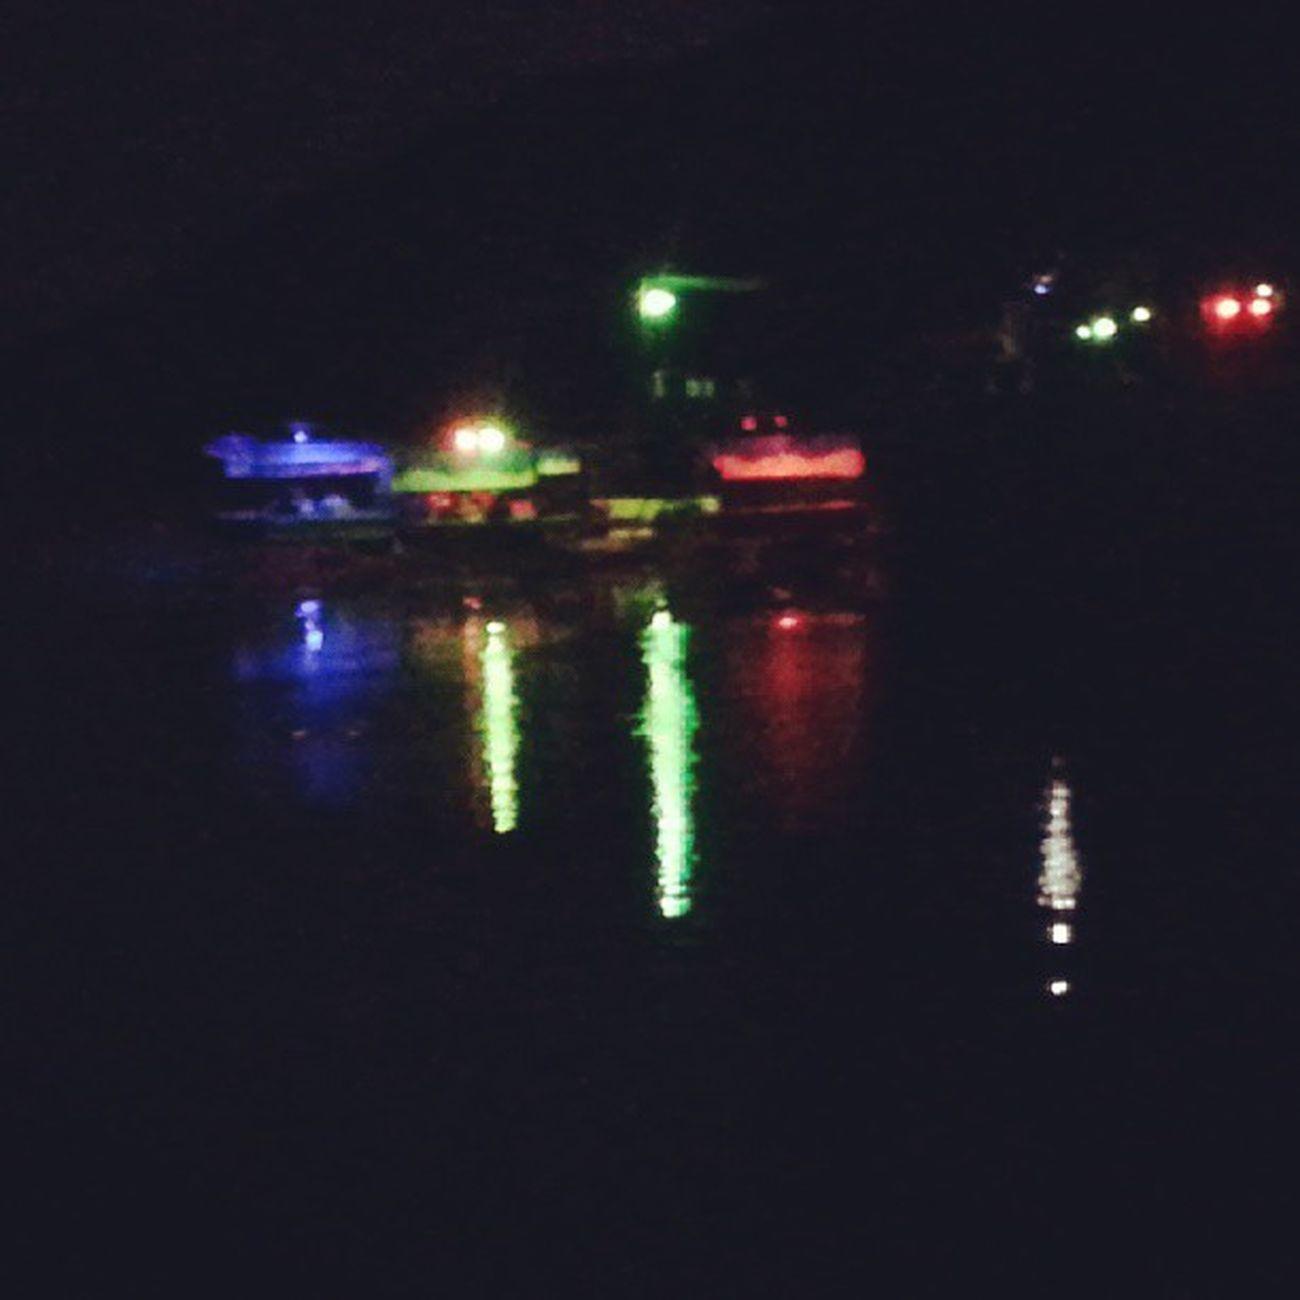 Night restaurants over the river..